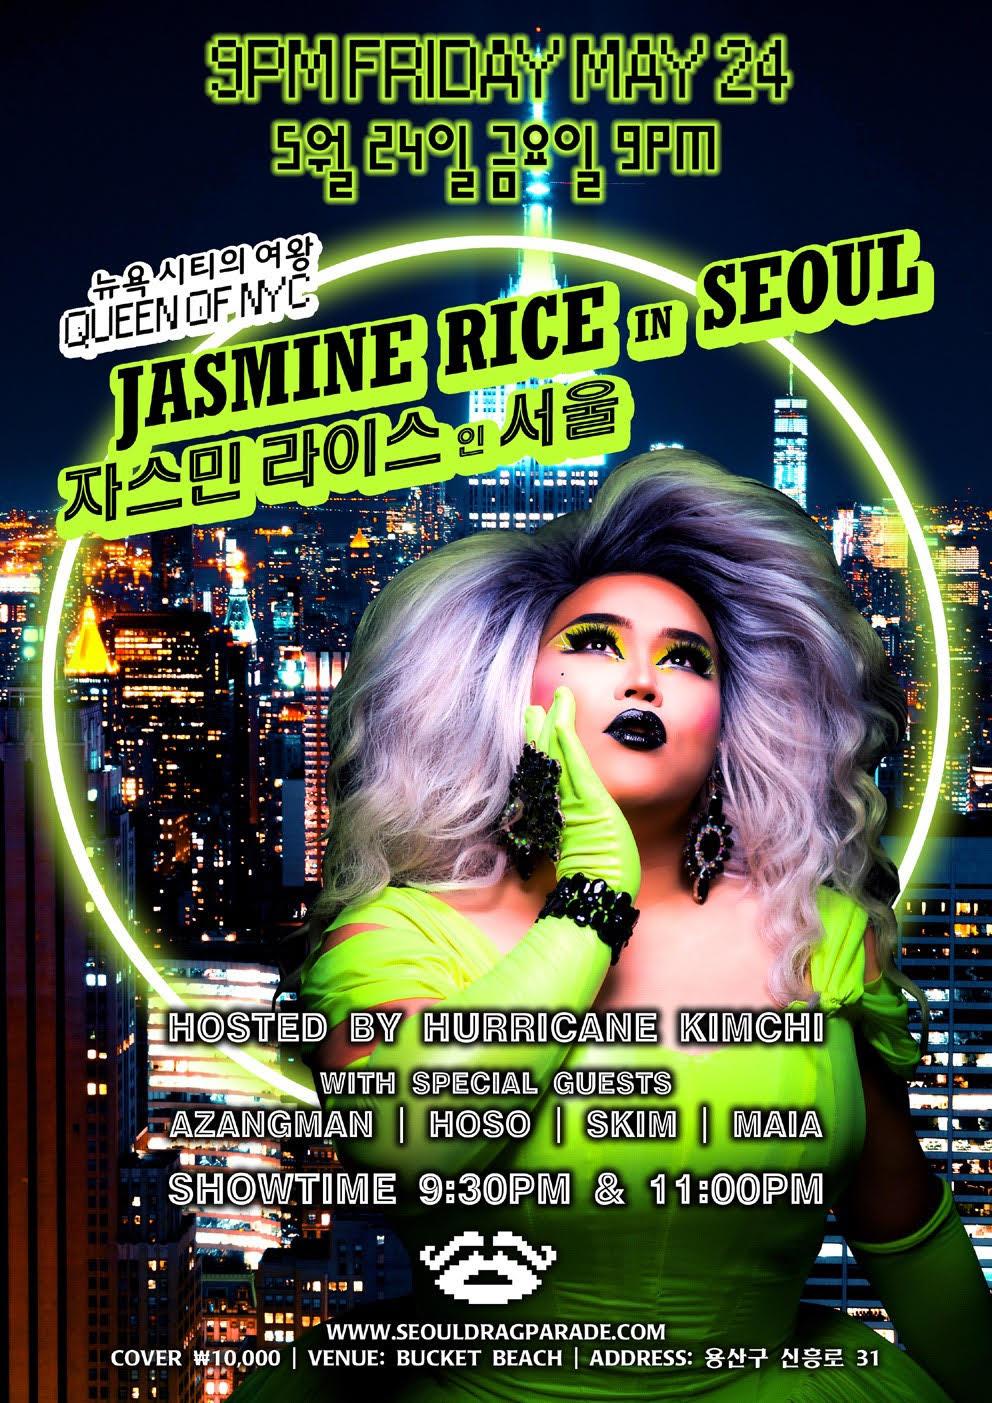 The Queen of NYC: Jasmine Rice! - at Bucket Beach in HBC